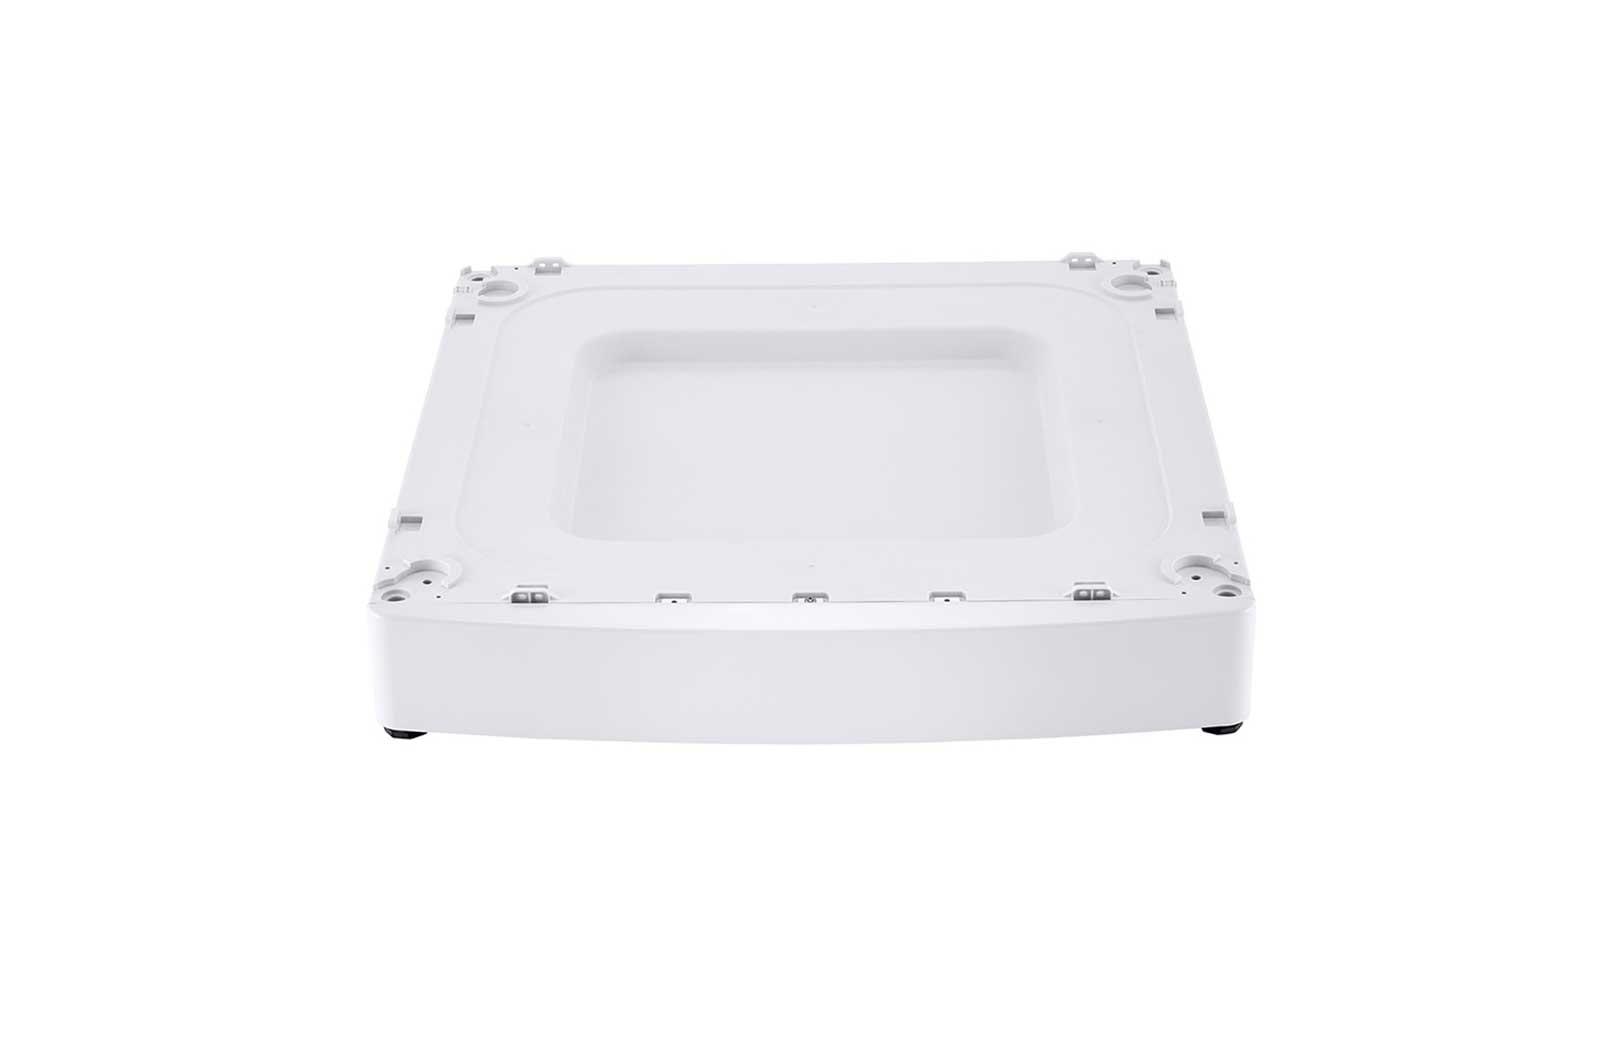 LG AppliancesAda Compliant Laundry Pedestal Riser - White